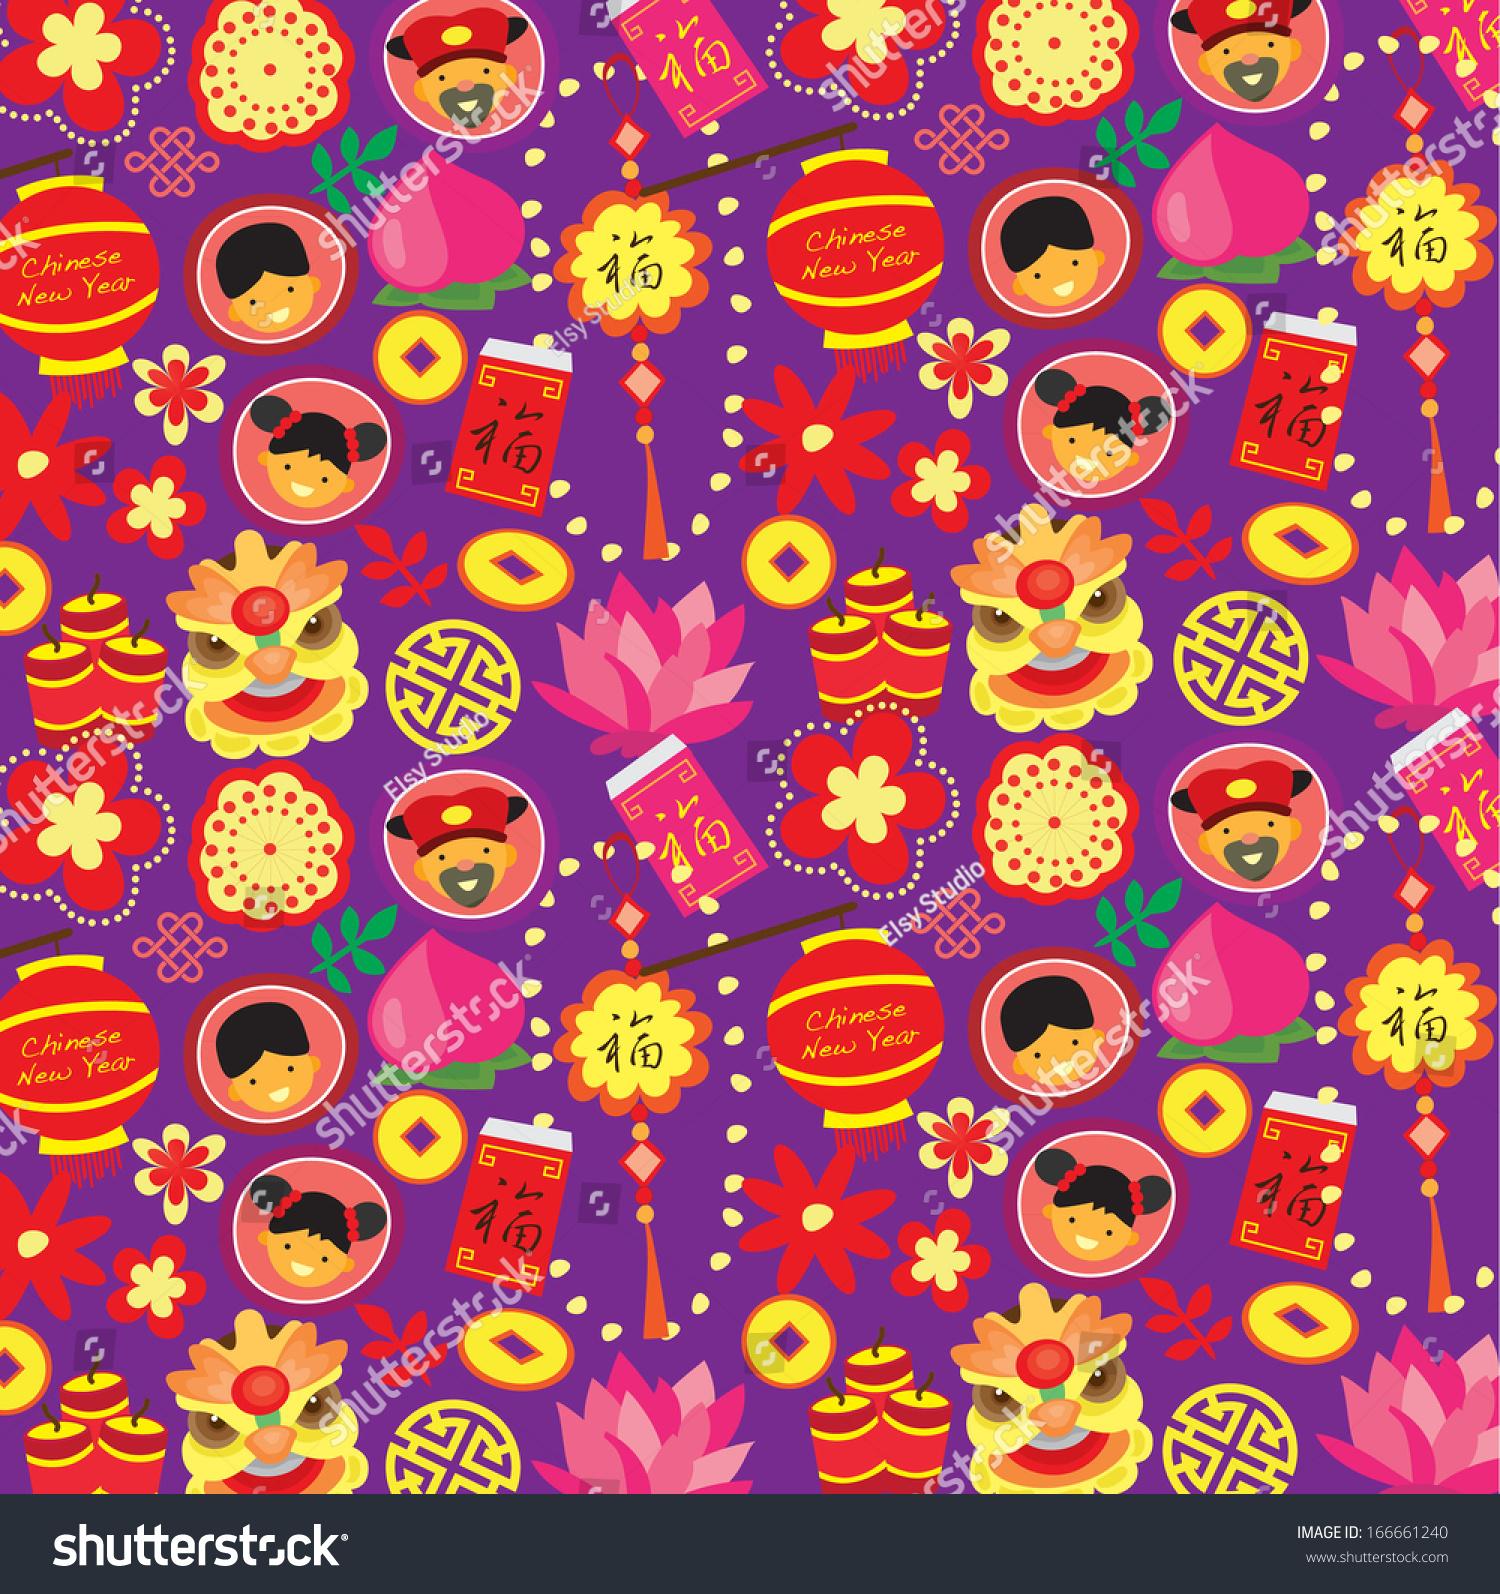 Chinese New Year Cartoon Wallpaper Stock Vector 166661240